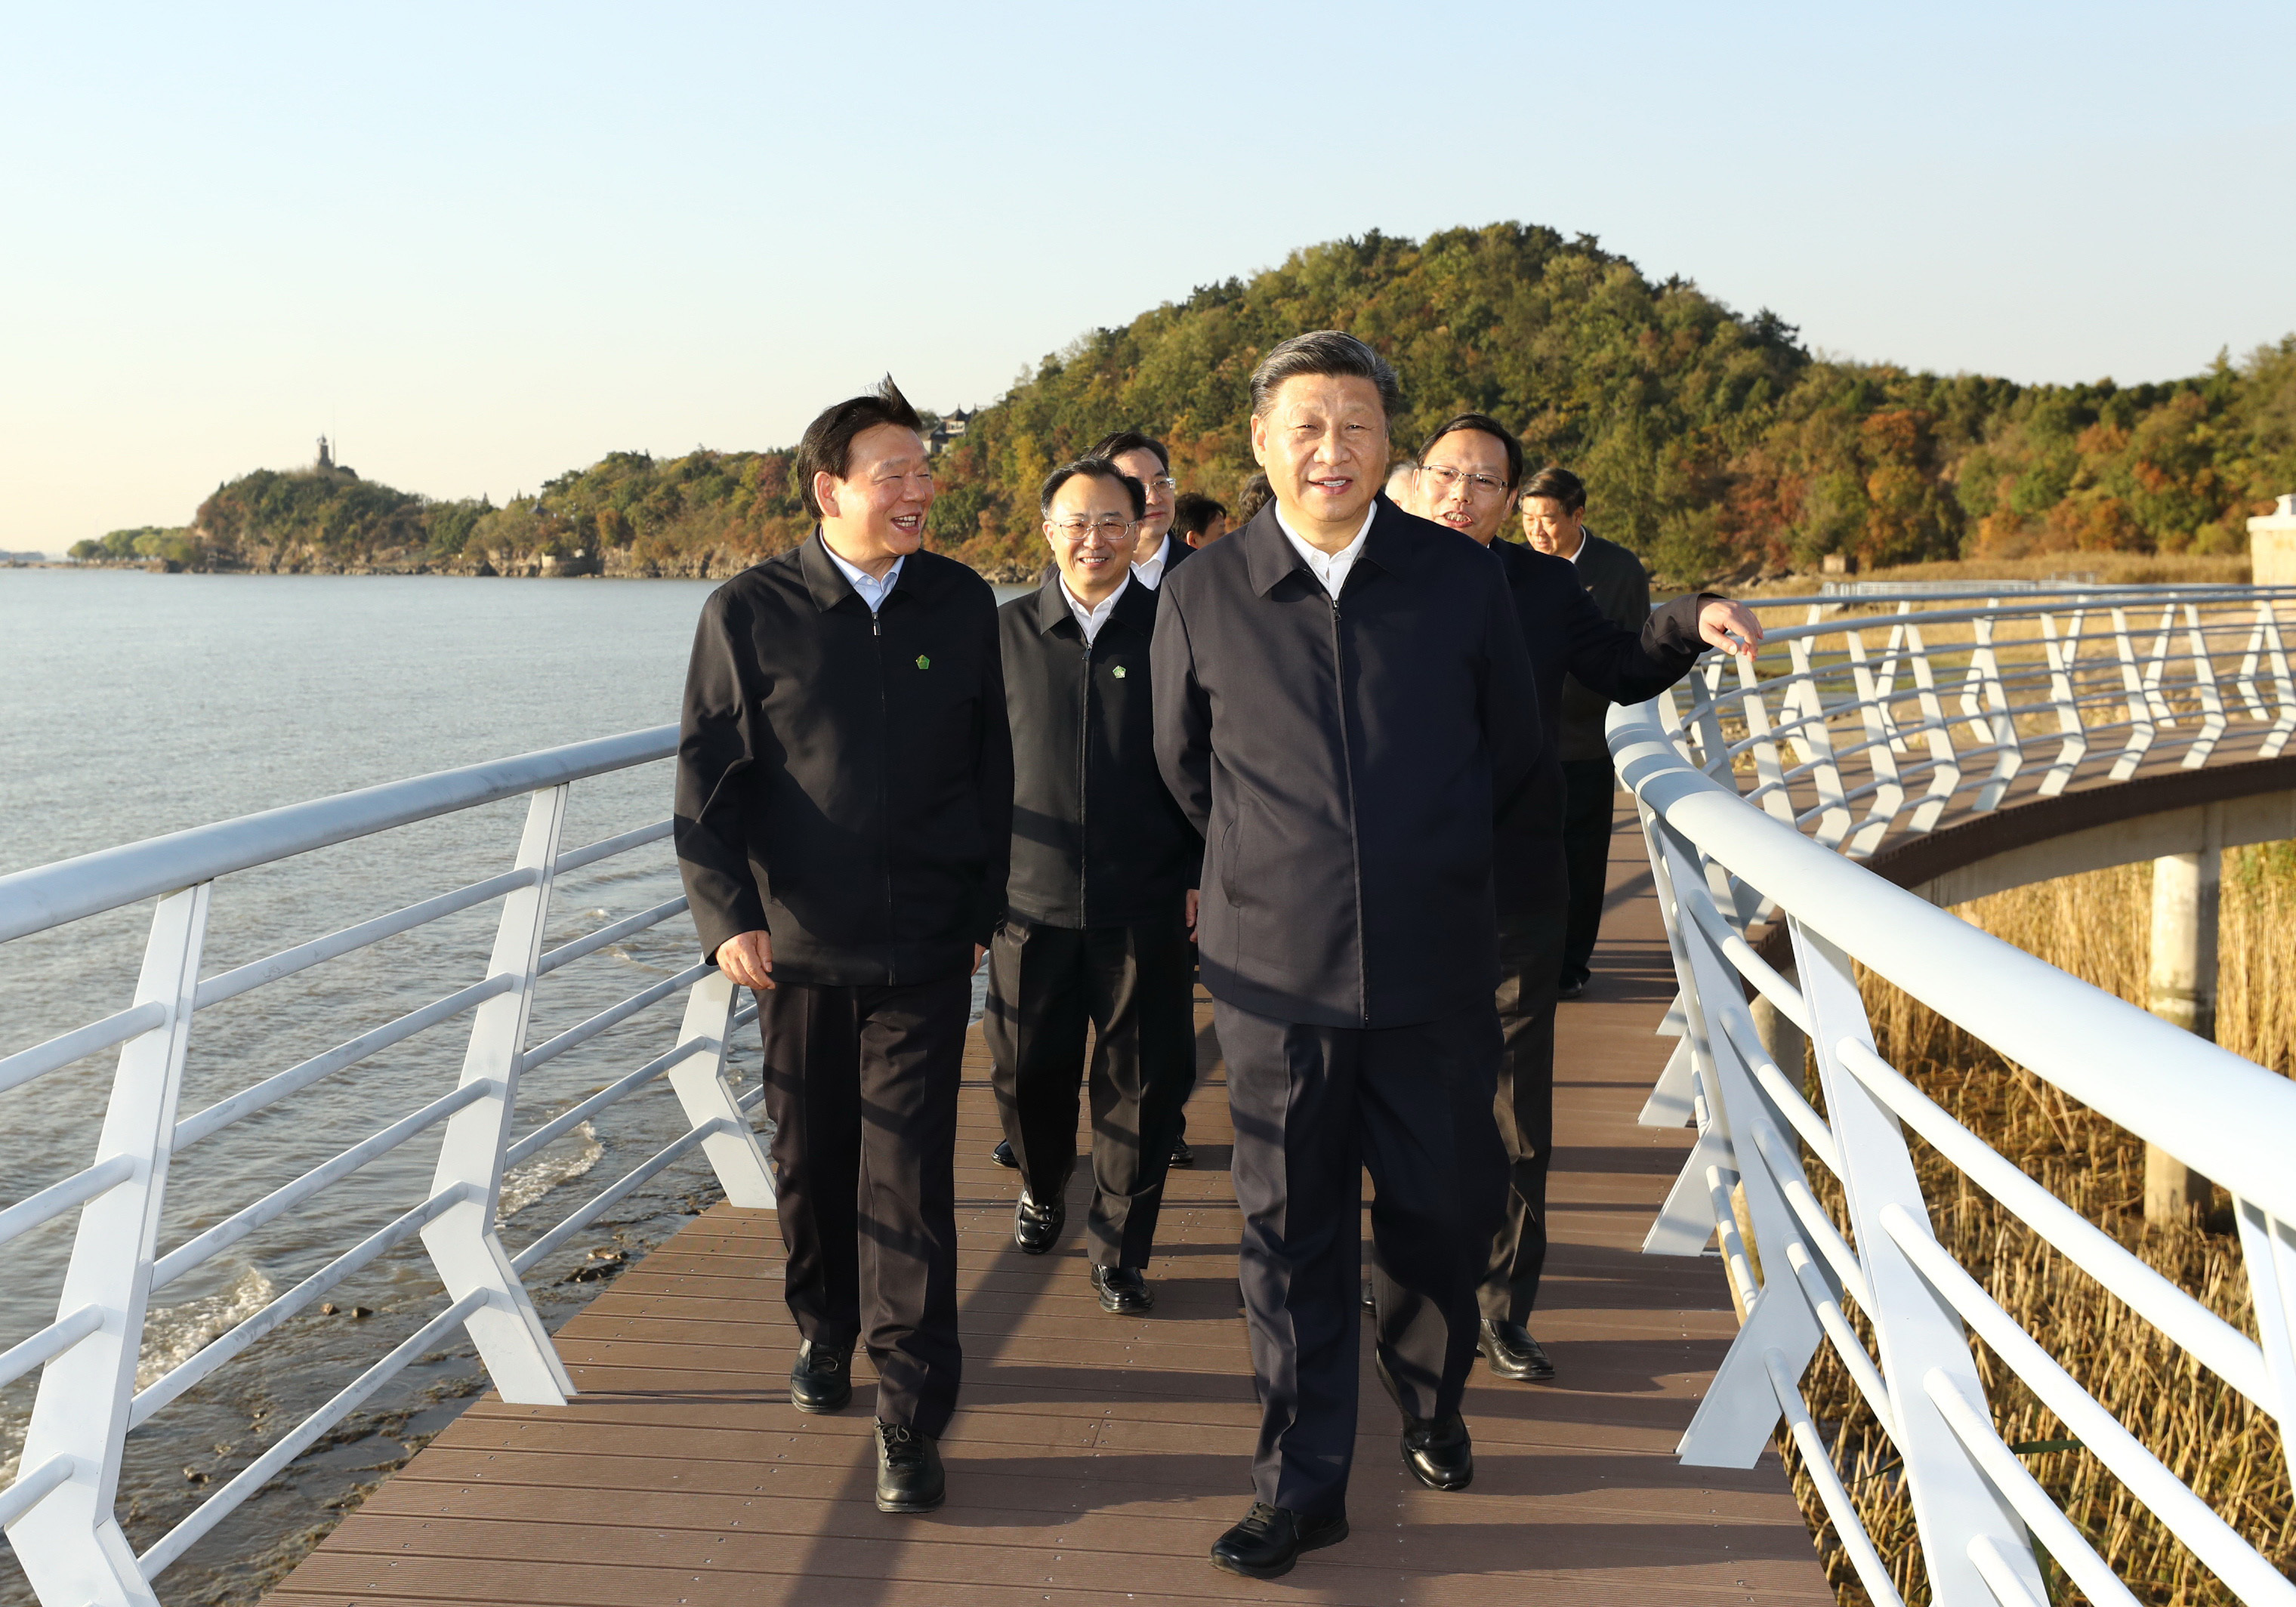 Xi inspects environmental protection of Yangtze River